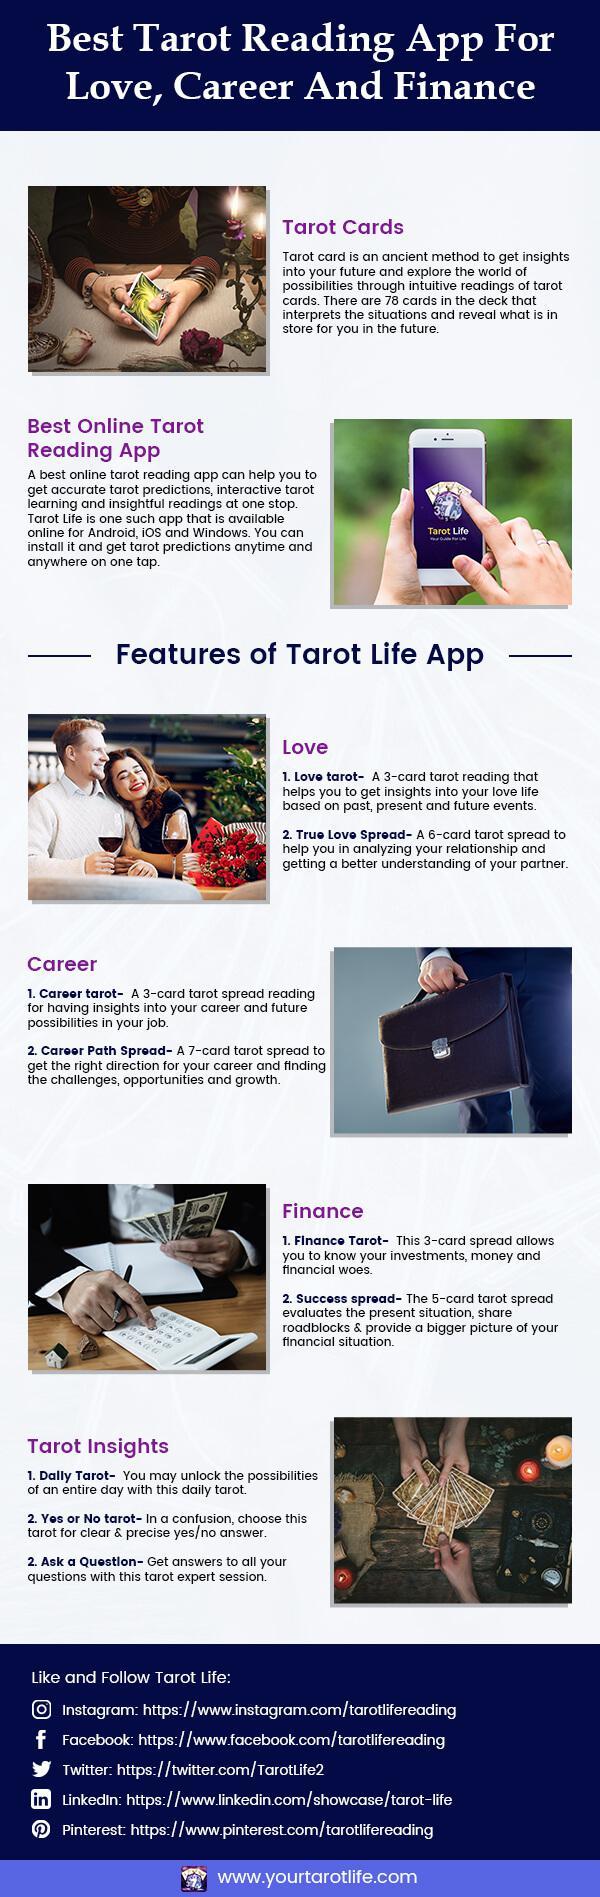 Best tarot reading app for love career and finance